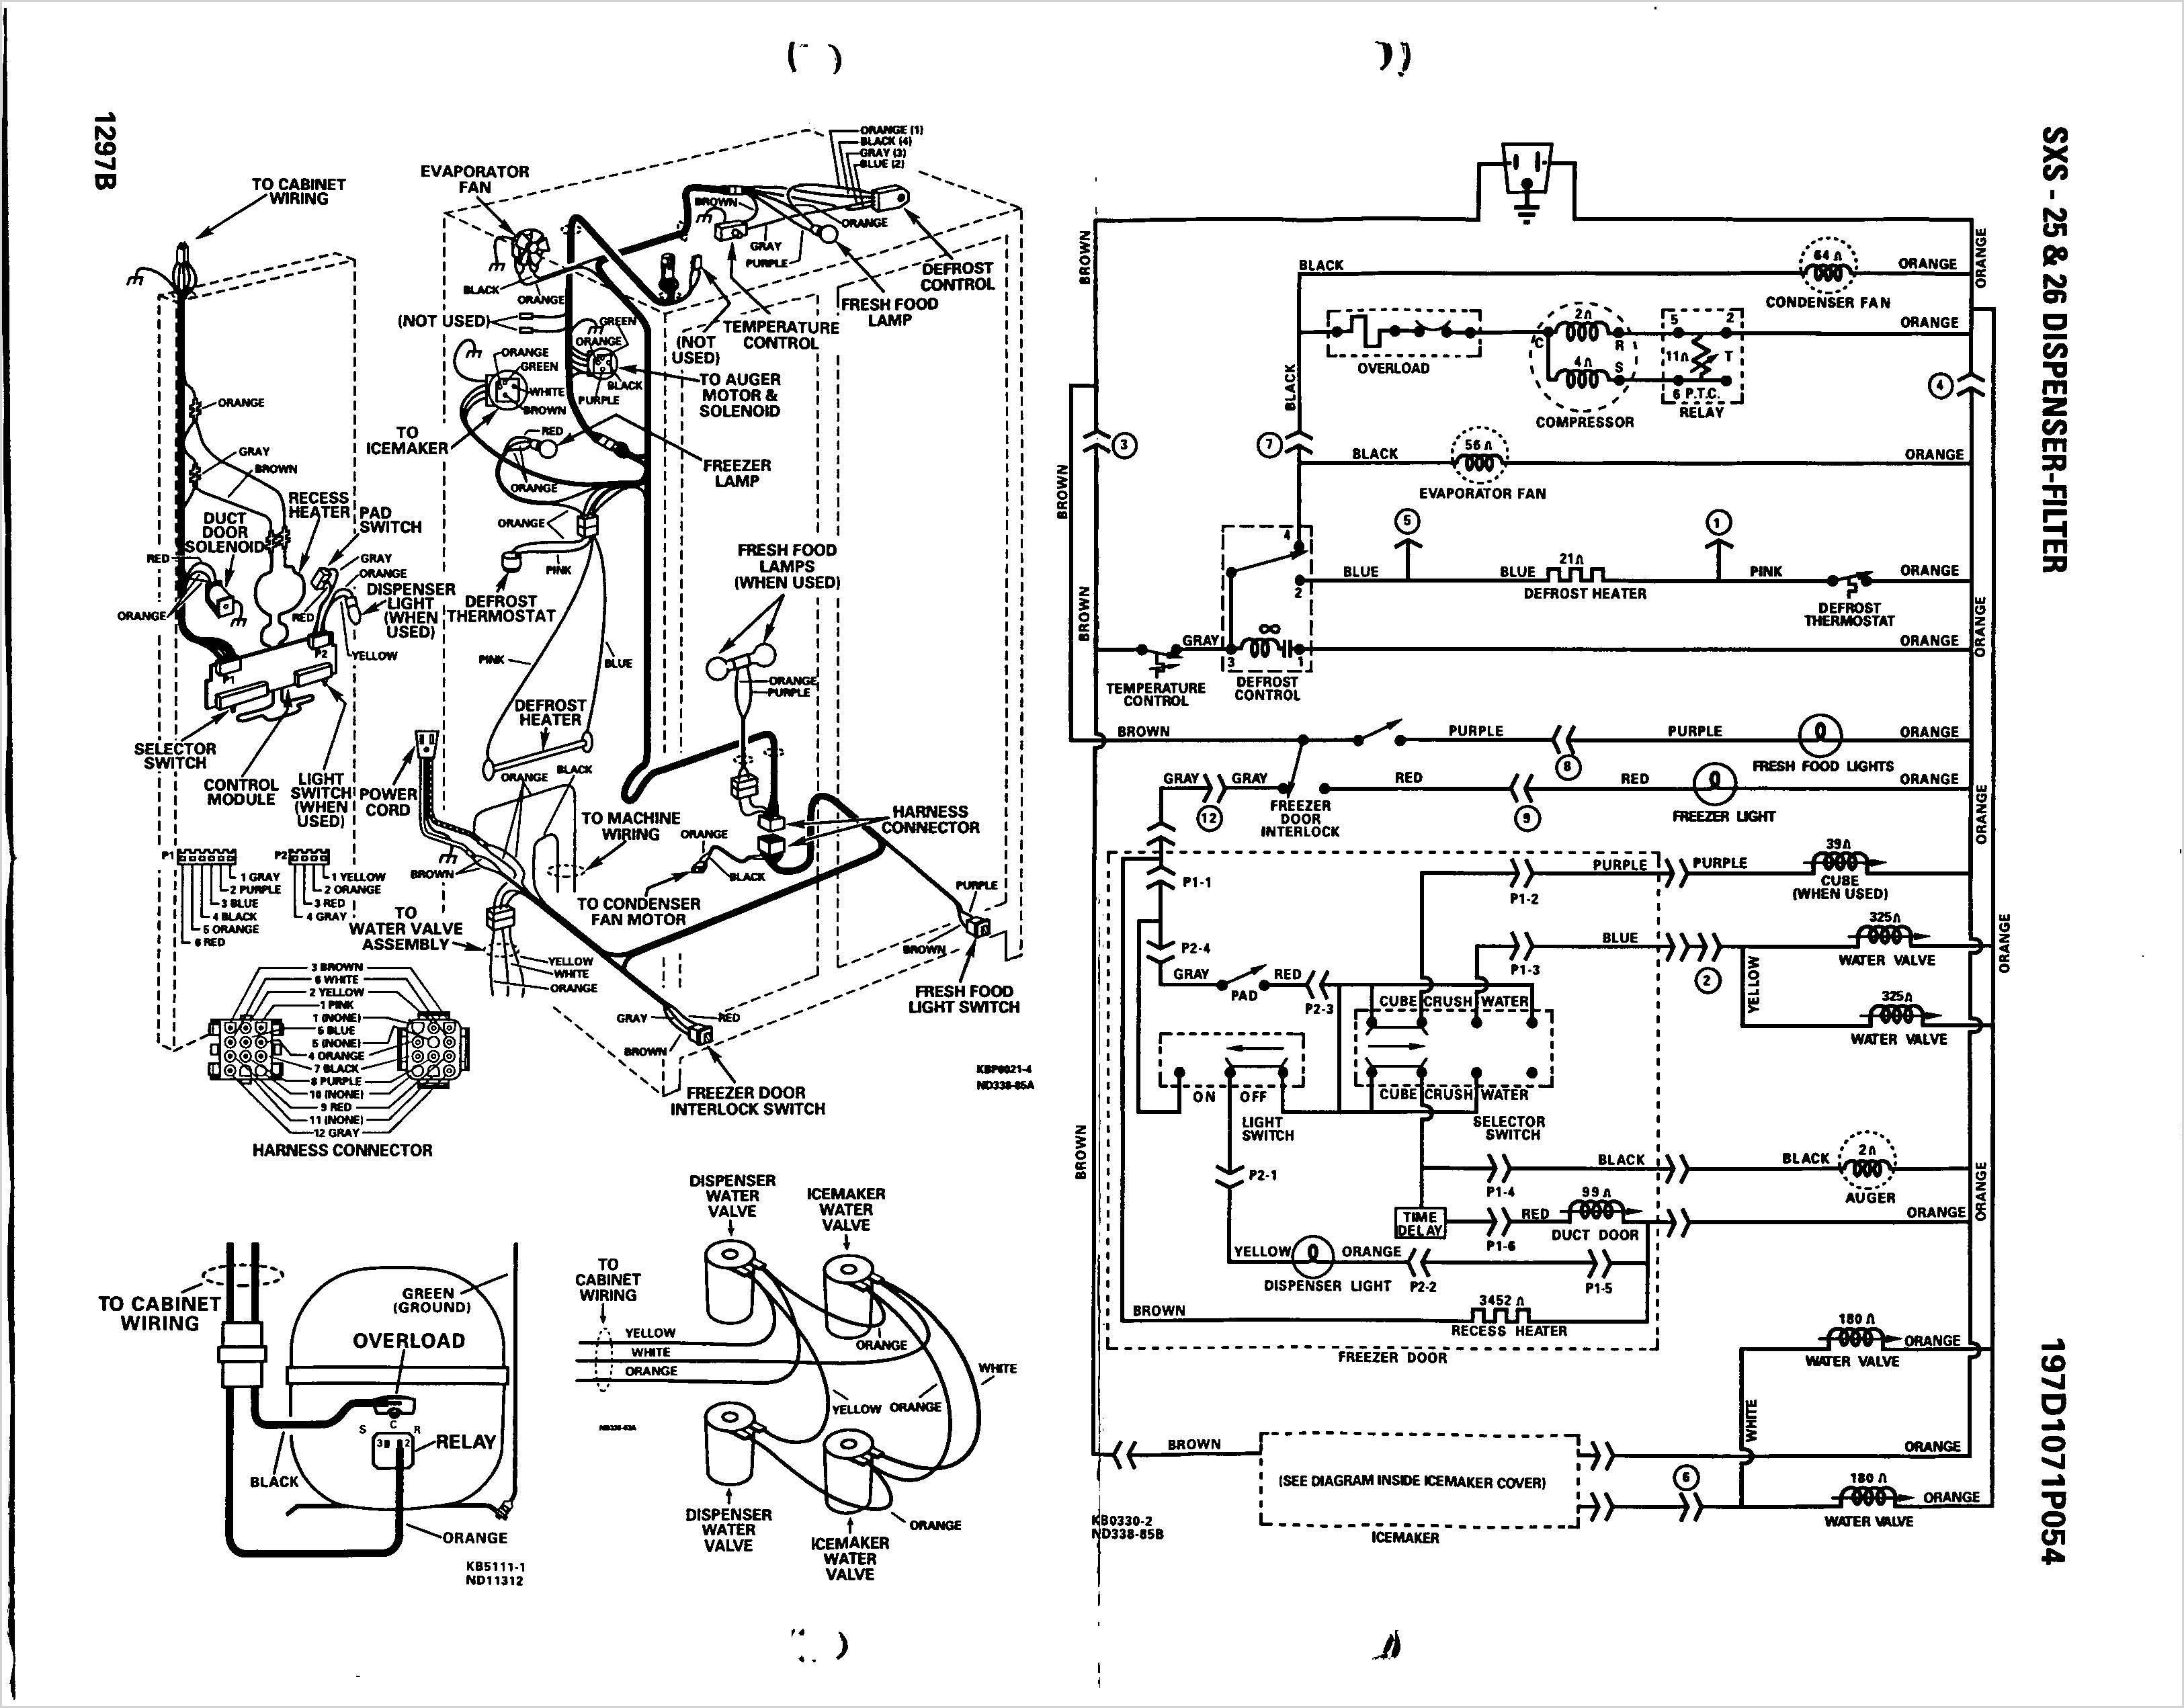 Stove Schematic Wiring Diagram | Wiring Diagram - Ge Refrigerator Wiring Diagram